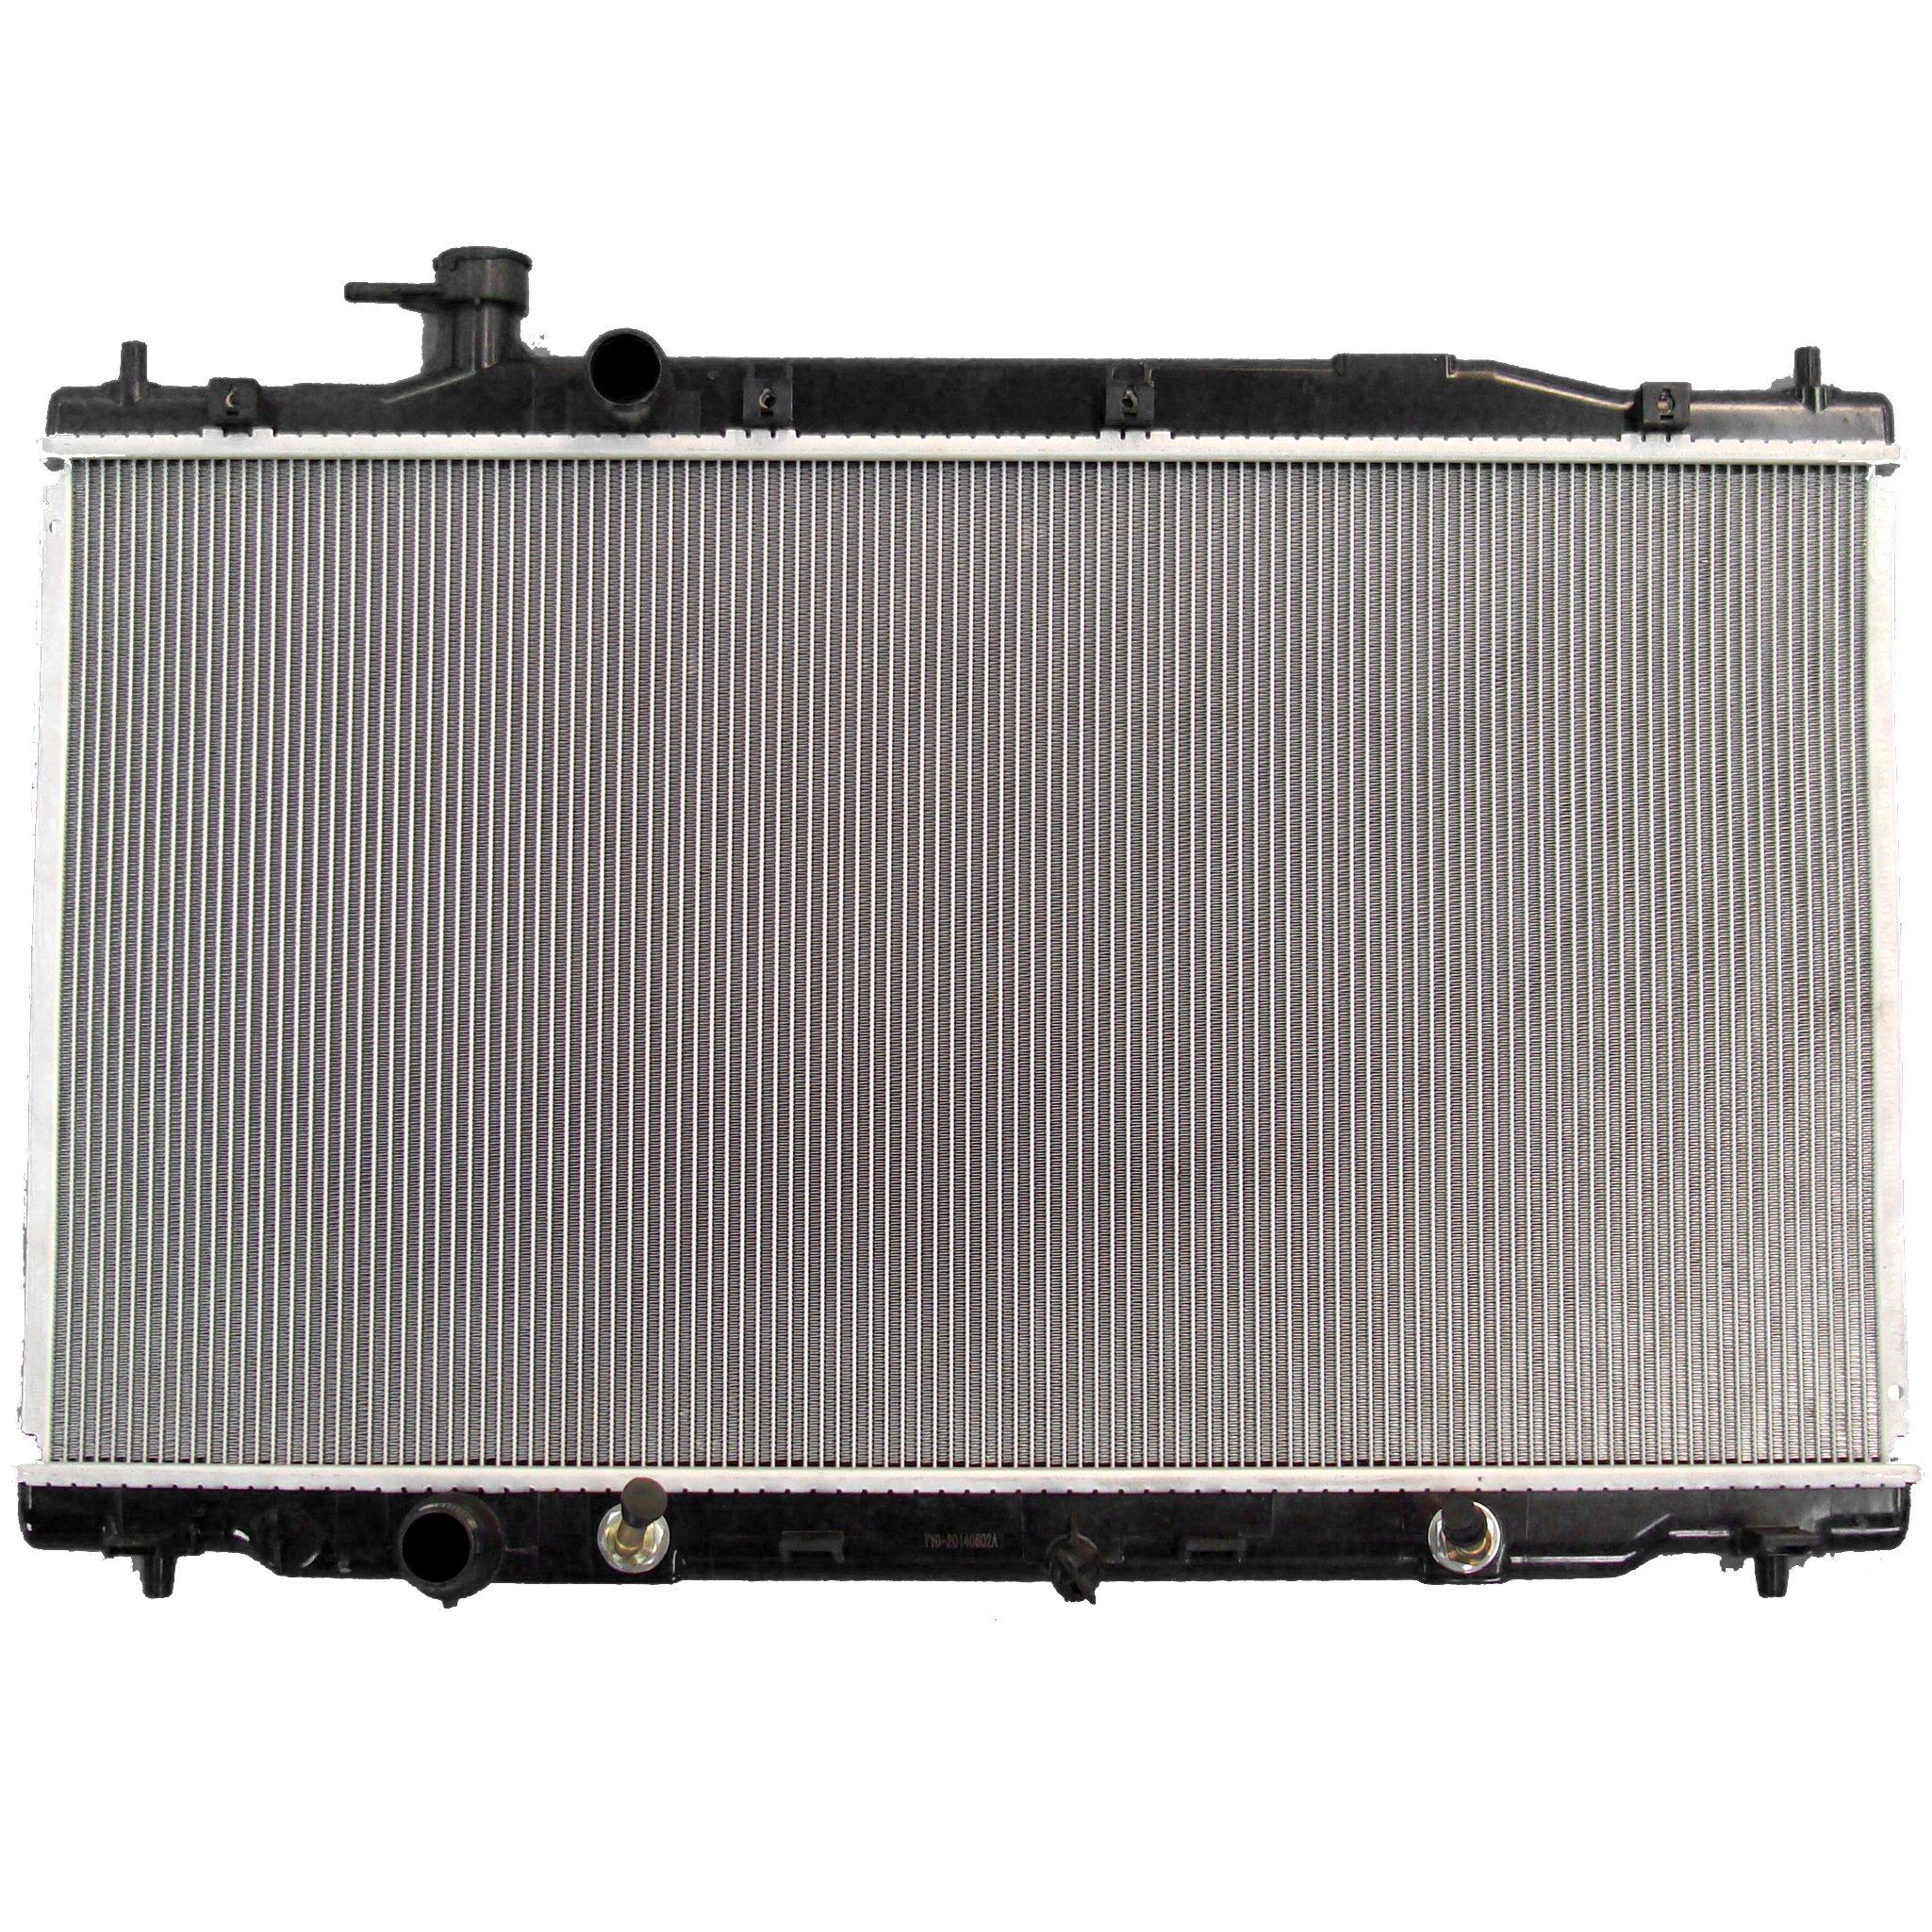 ECCPP Radiator 13031 for 2007-2009 Honda CR-V EX/EX-L/LX Sport Utility 4-Door 2.4L